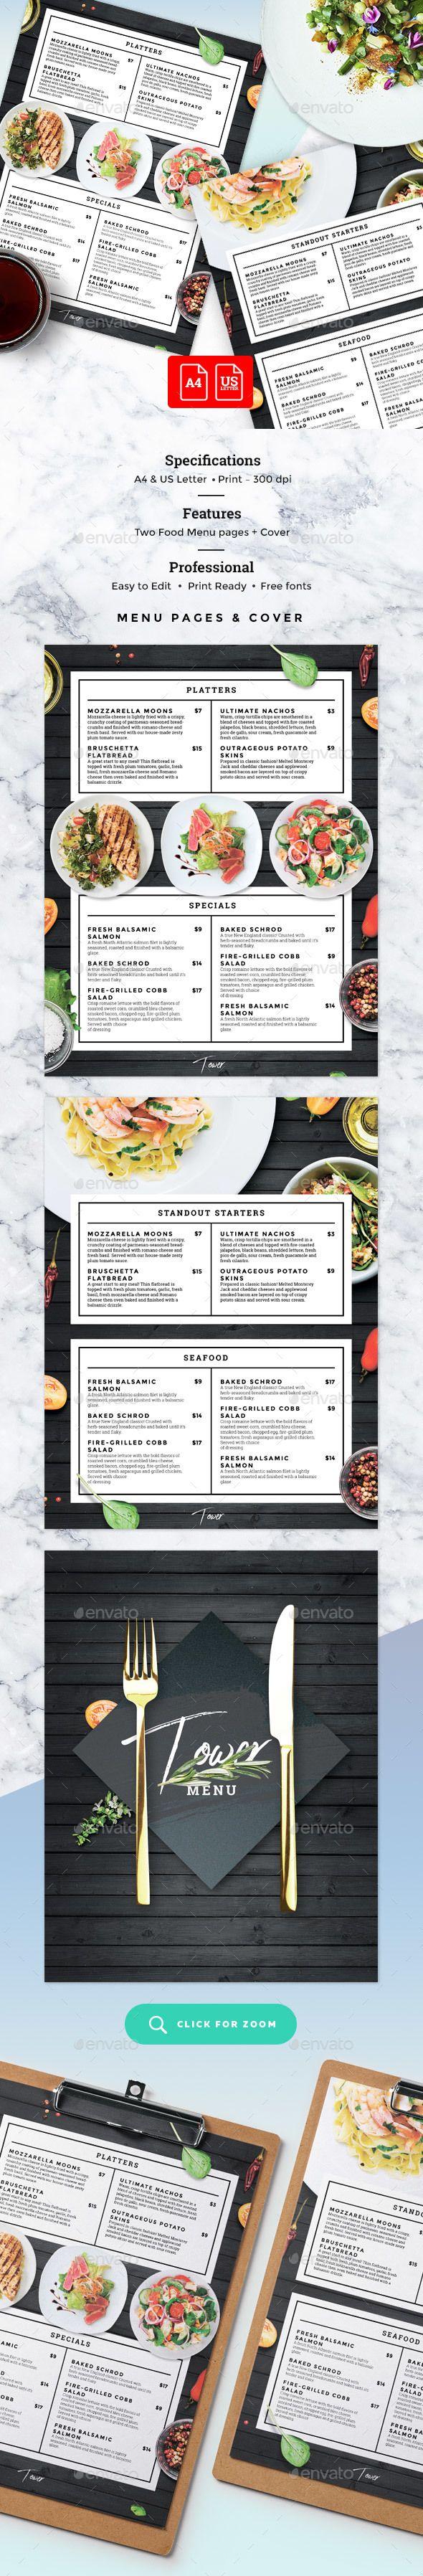 professional menu templates - Funf.pandroid.co